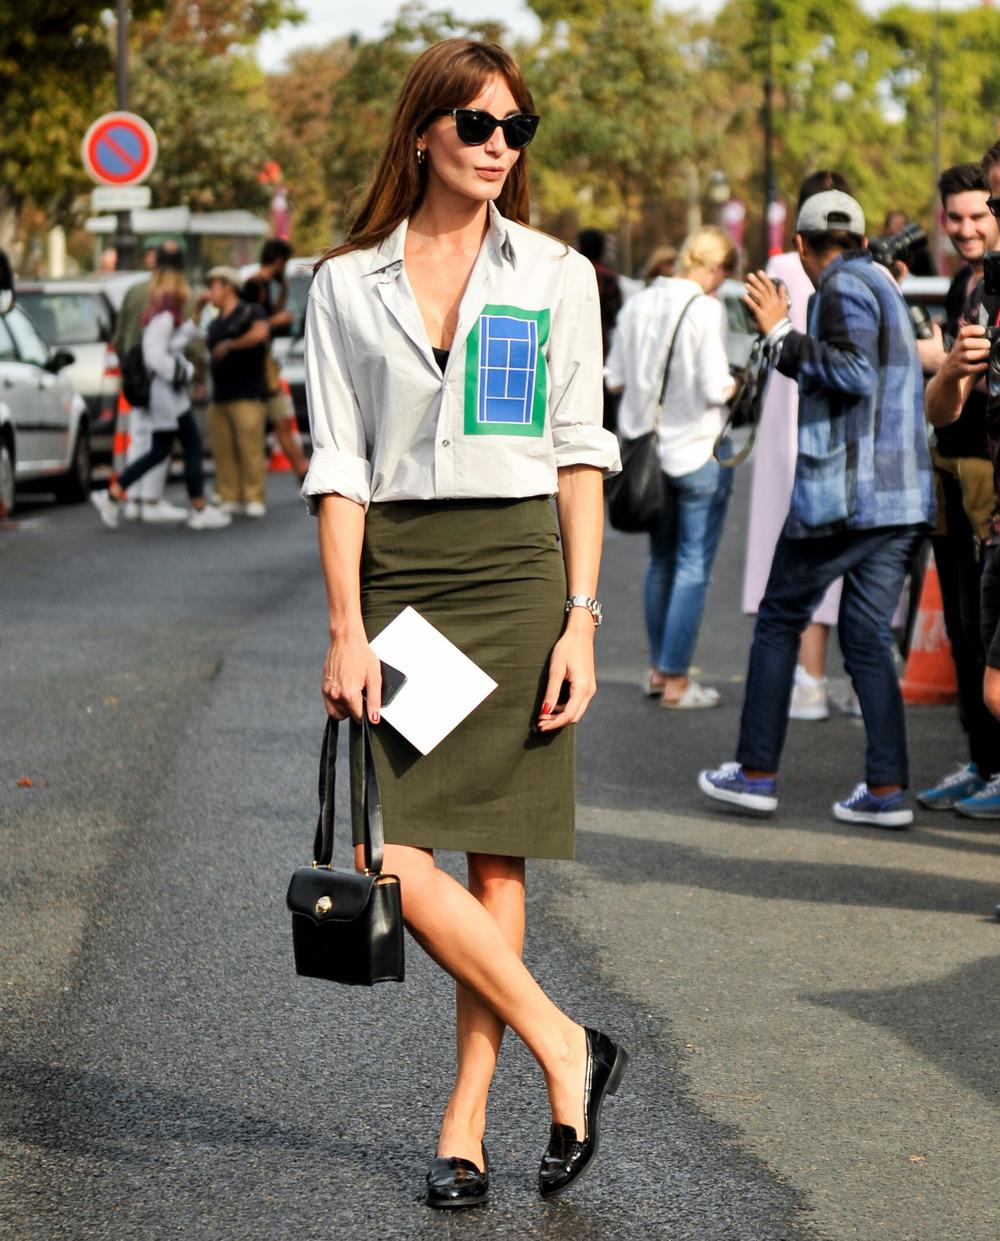 StreetStyle_ParisFashionWeek_LeandroJusten_139.jpg